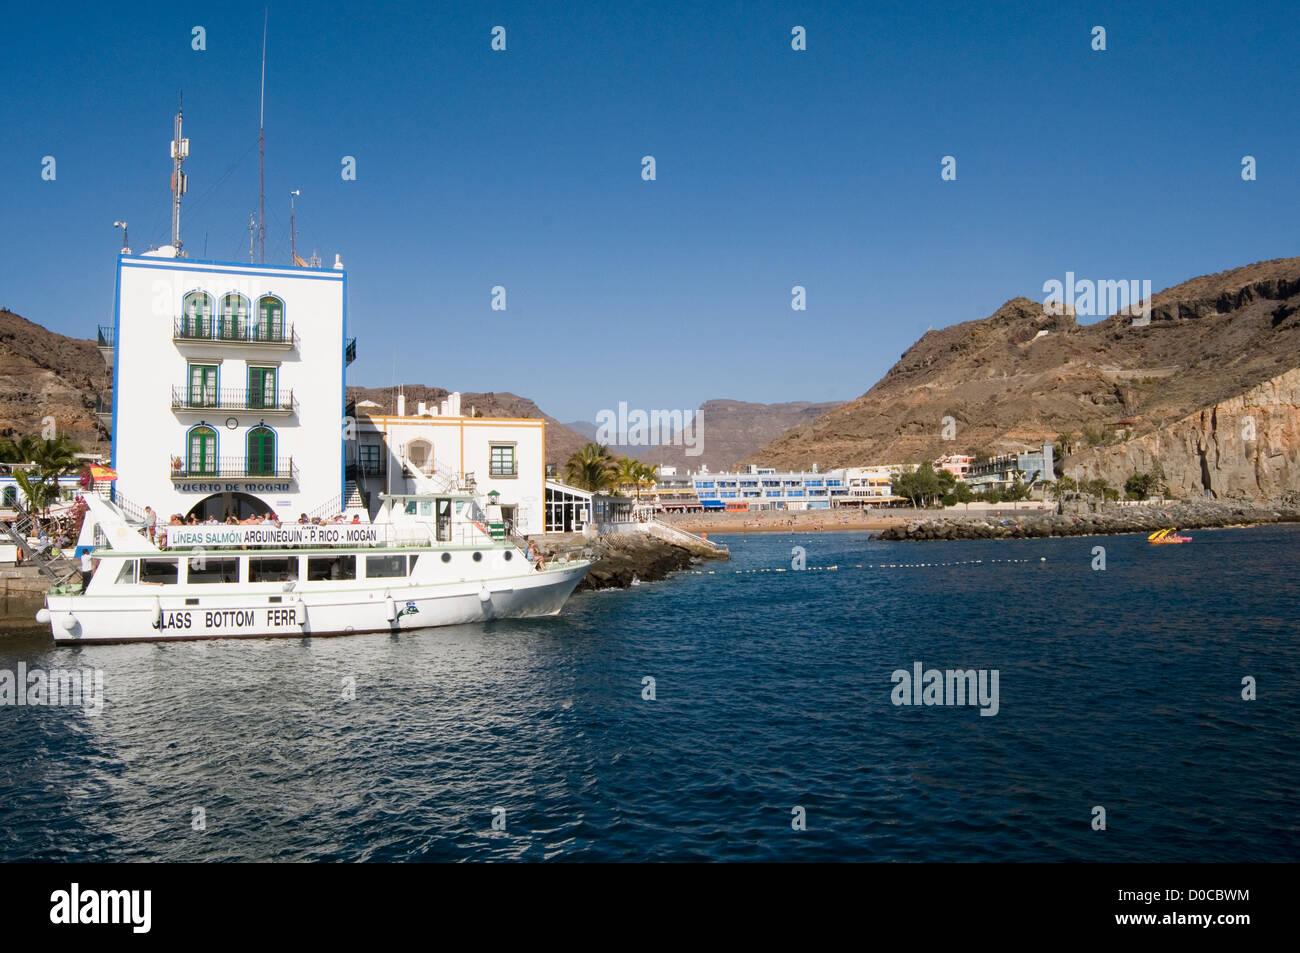 Puerto de Mogan Gran Canaria Hafen Hafen Boot Boote Kanarische Inseln Stockbild